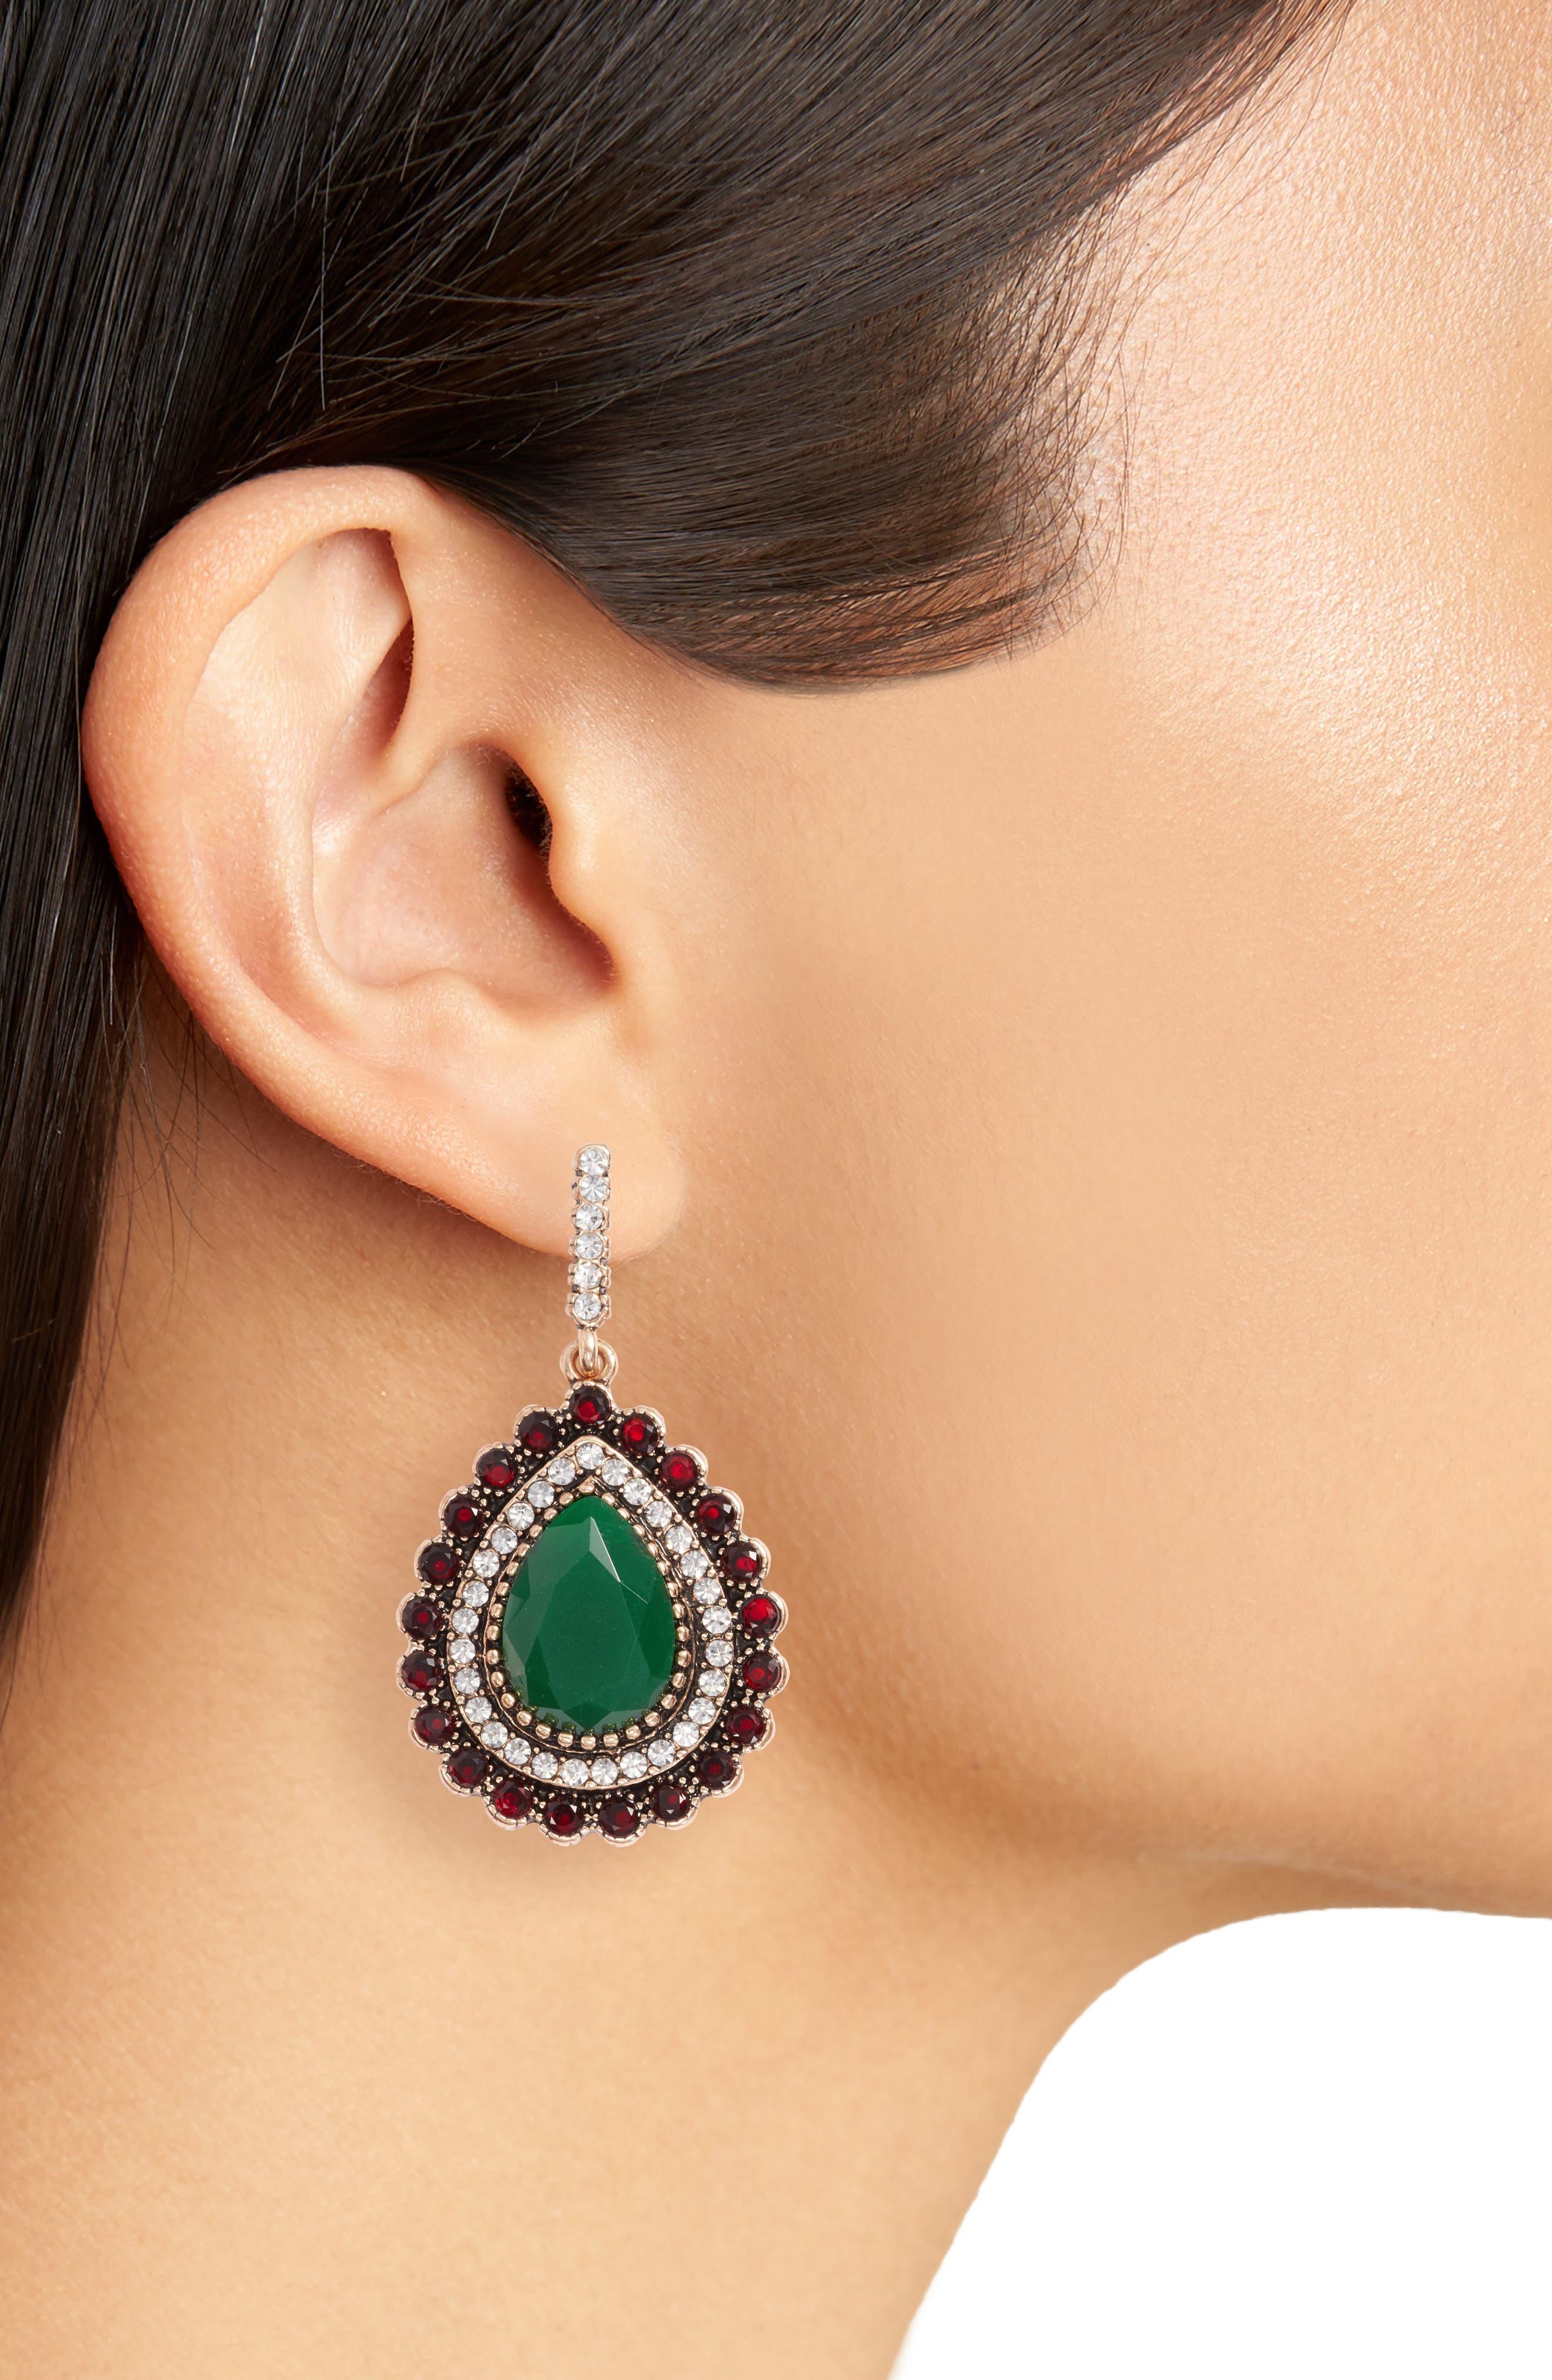 Lily Teardrop Earrings,                             Alternate thumbnail 2, color,                             300